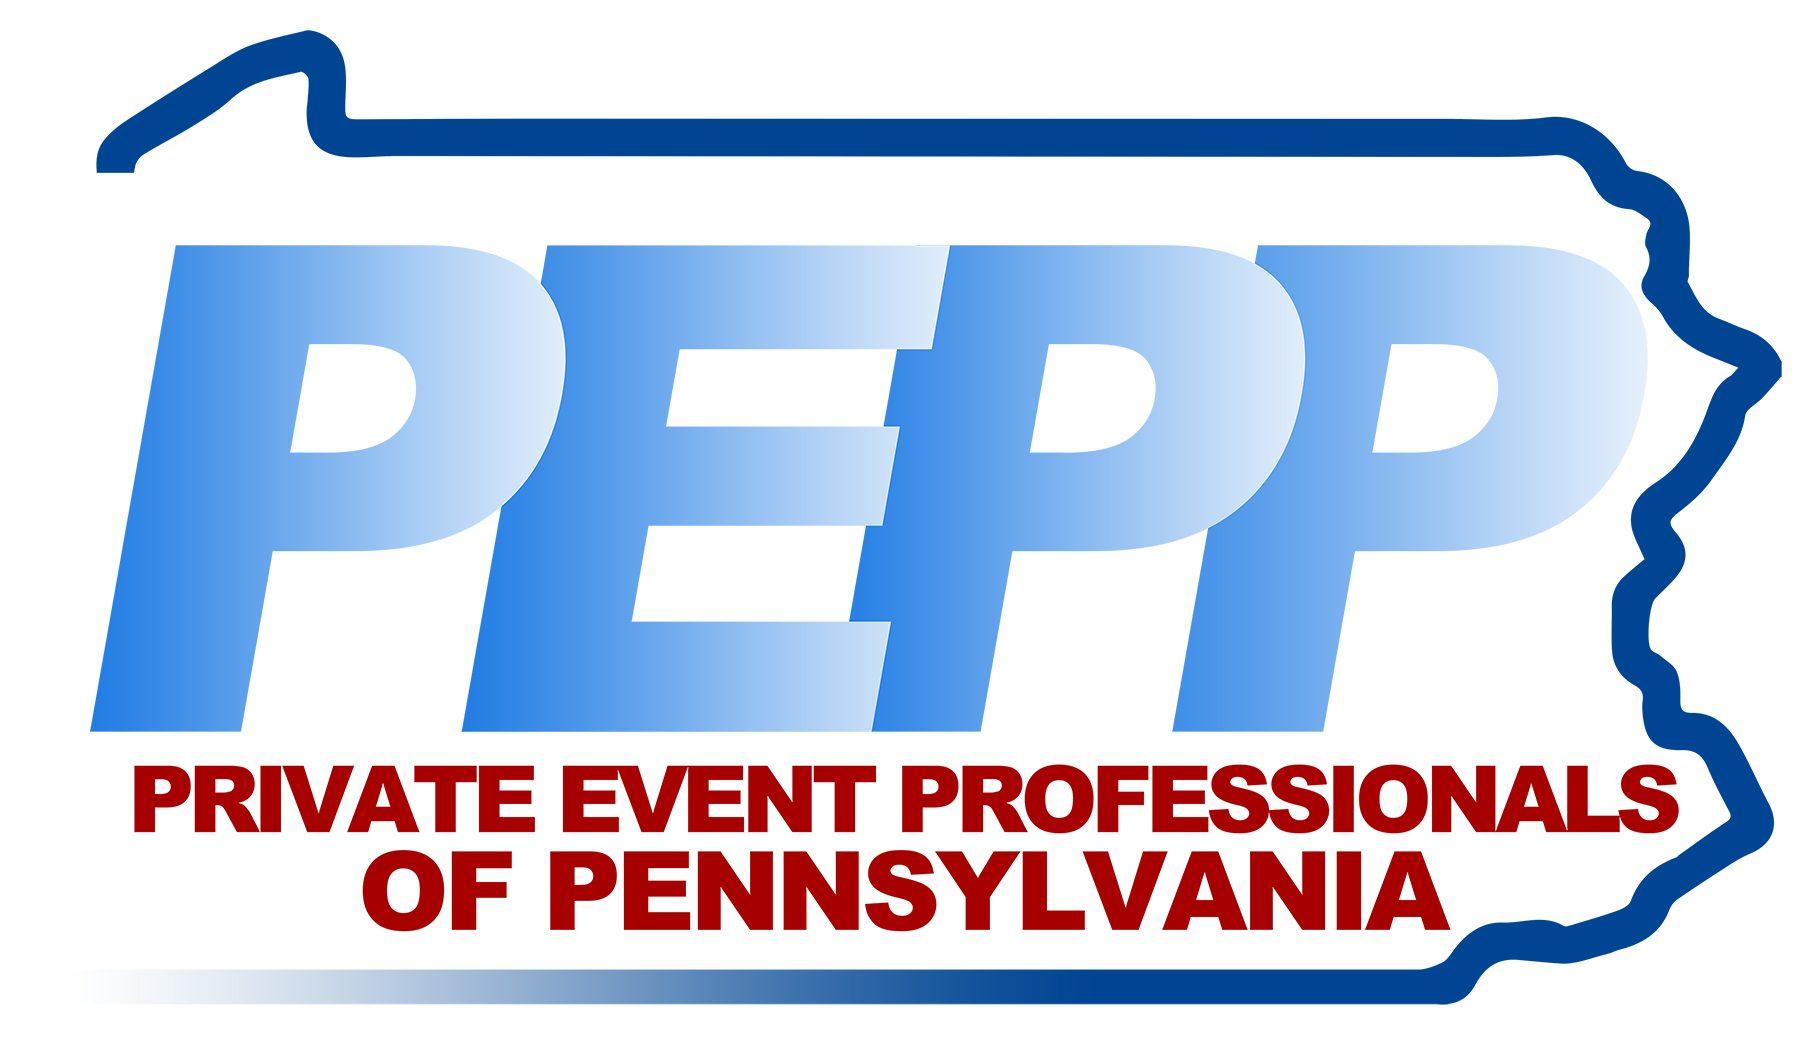 Private Event Professionals of Pennsylvania